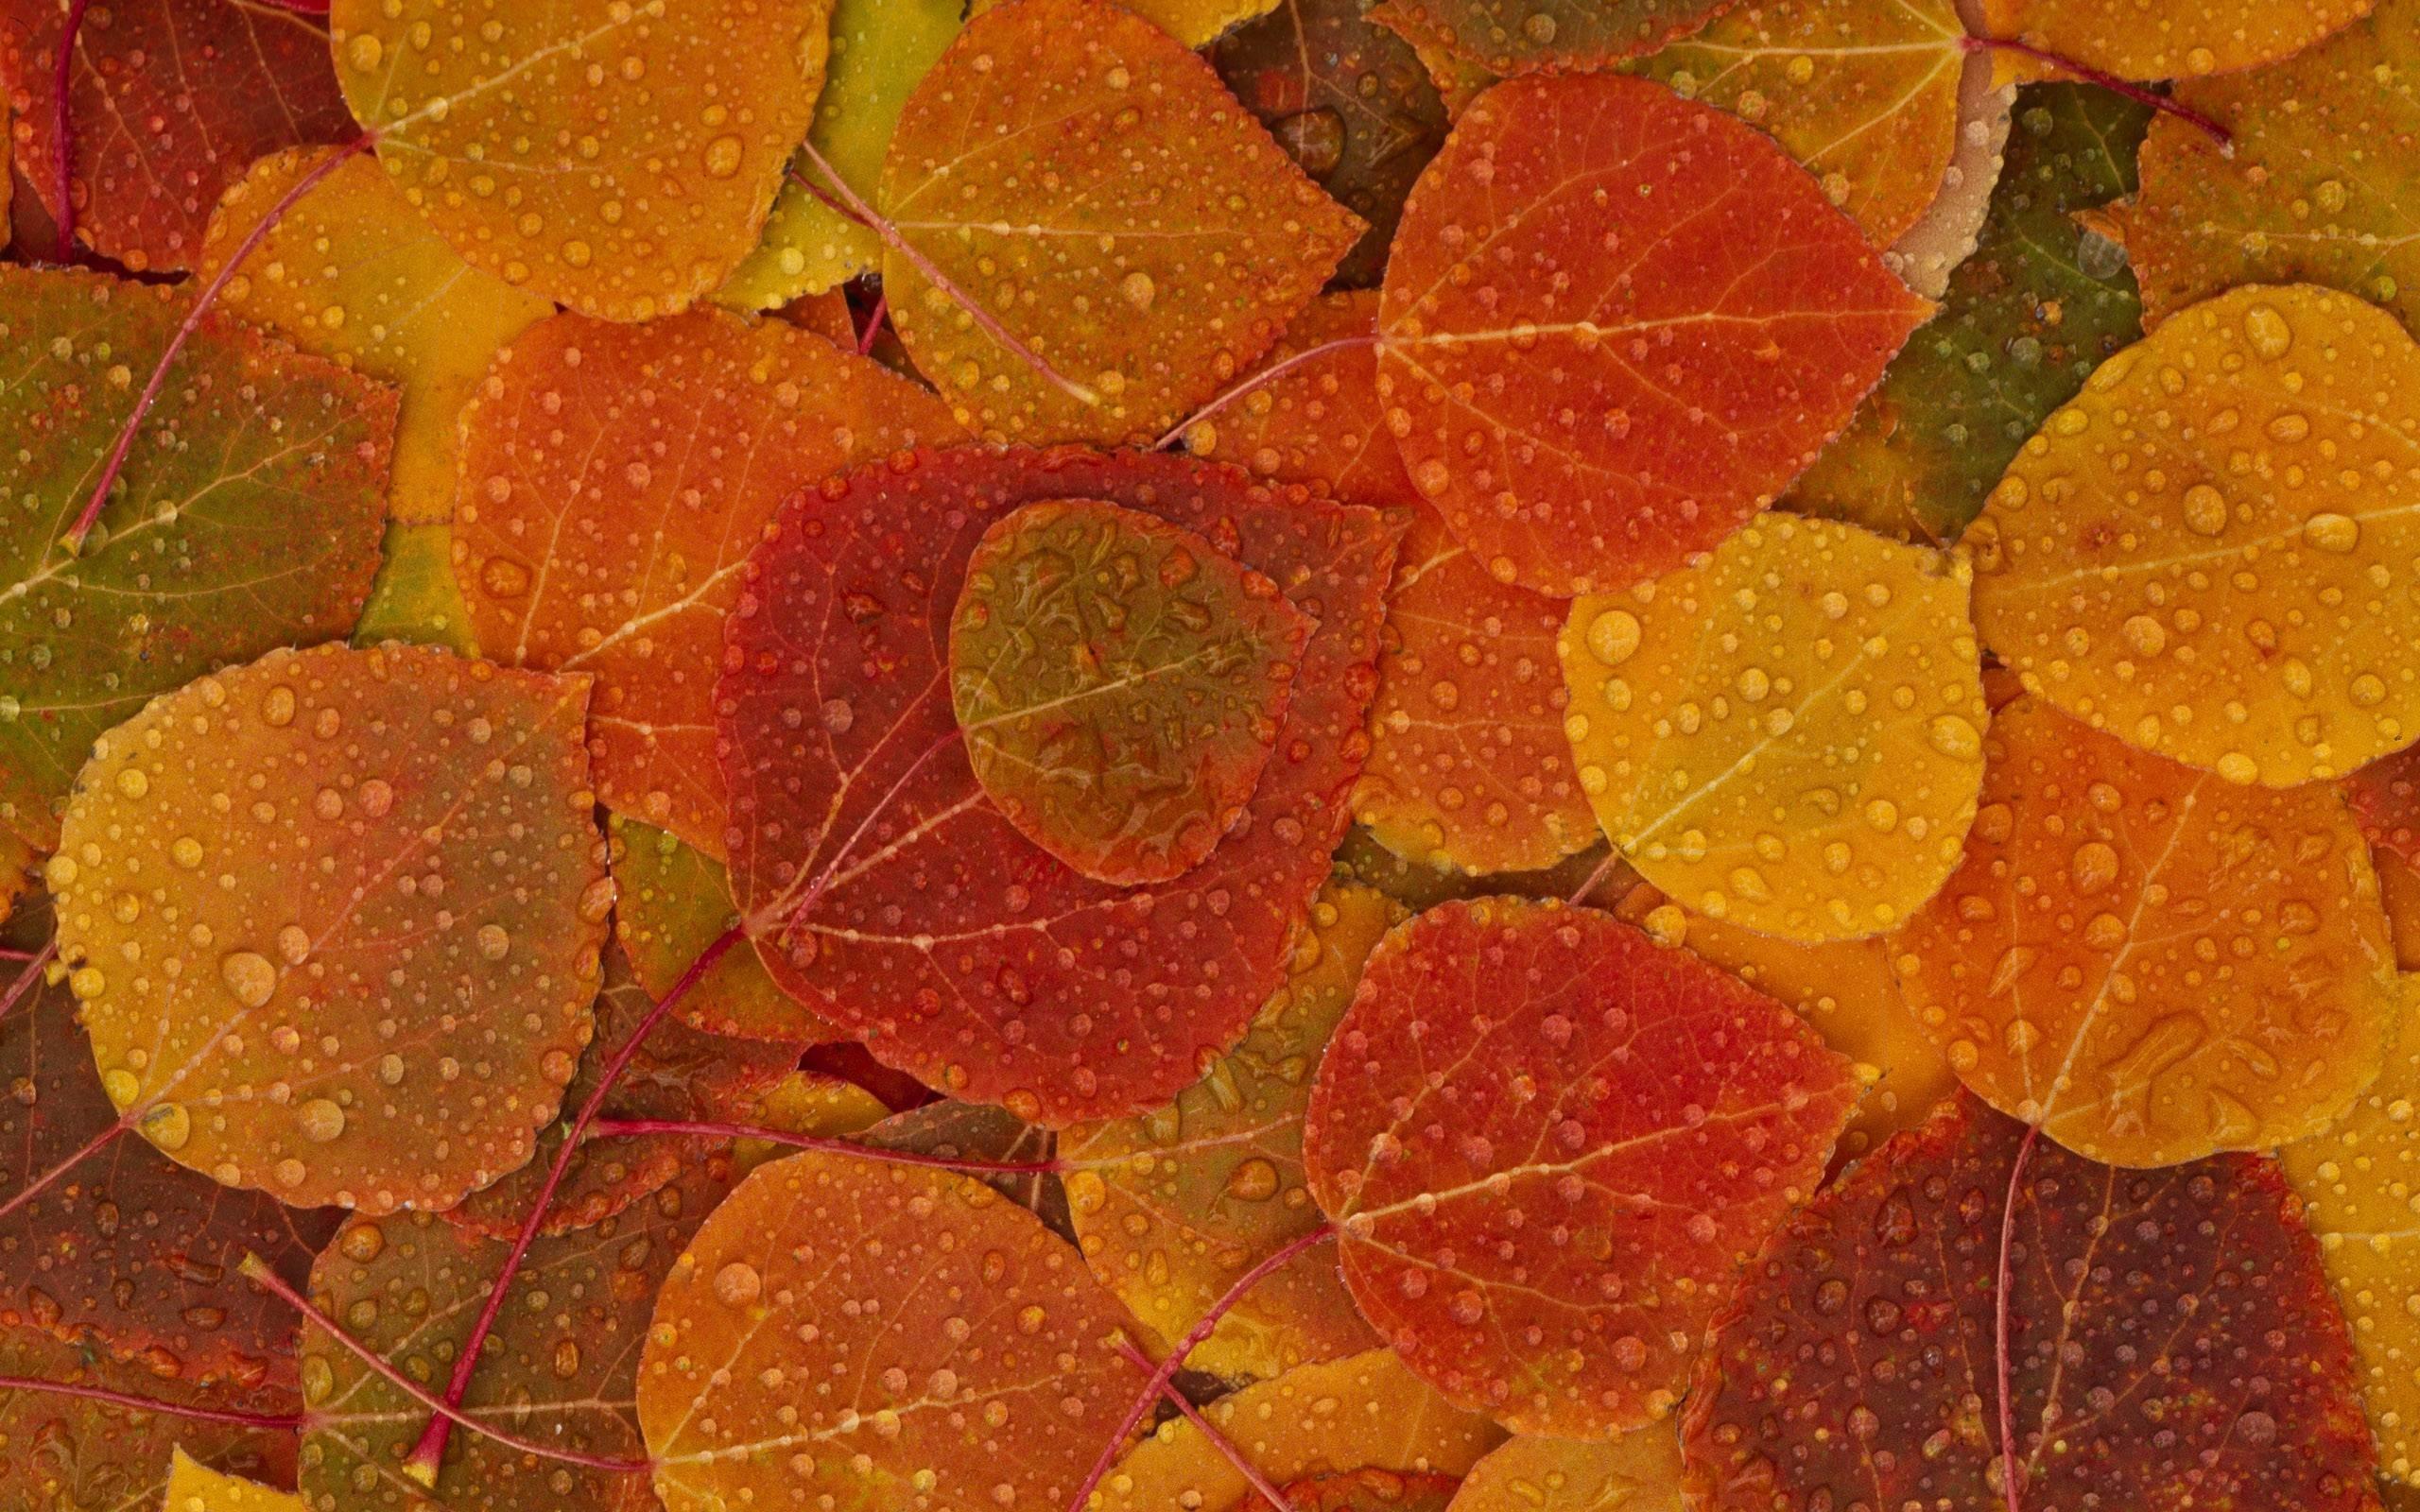 fall screensavers and wallpaper 49 images